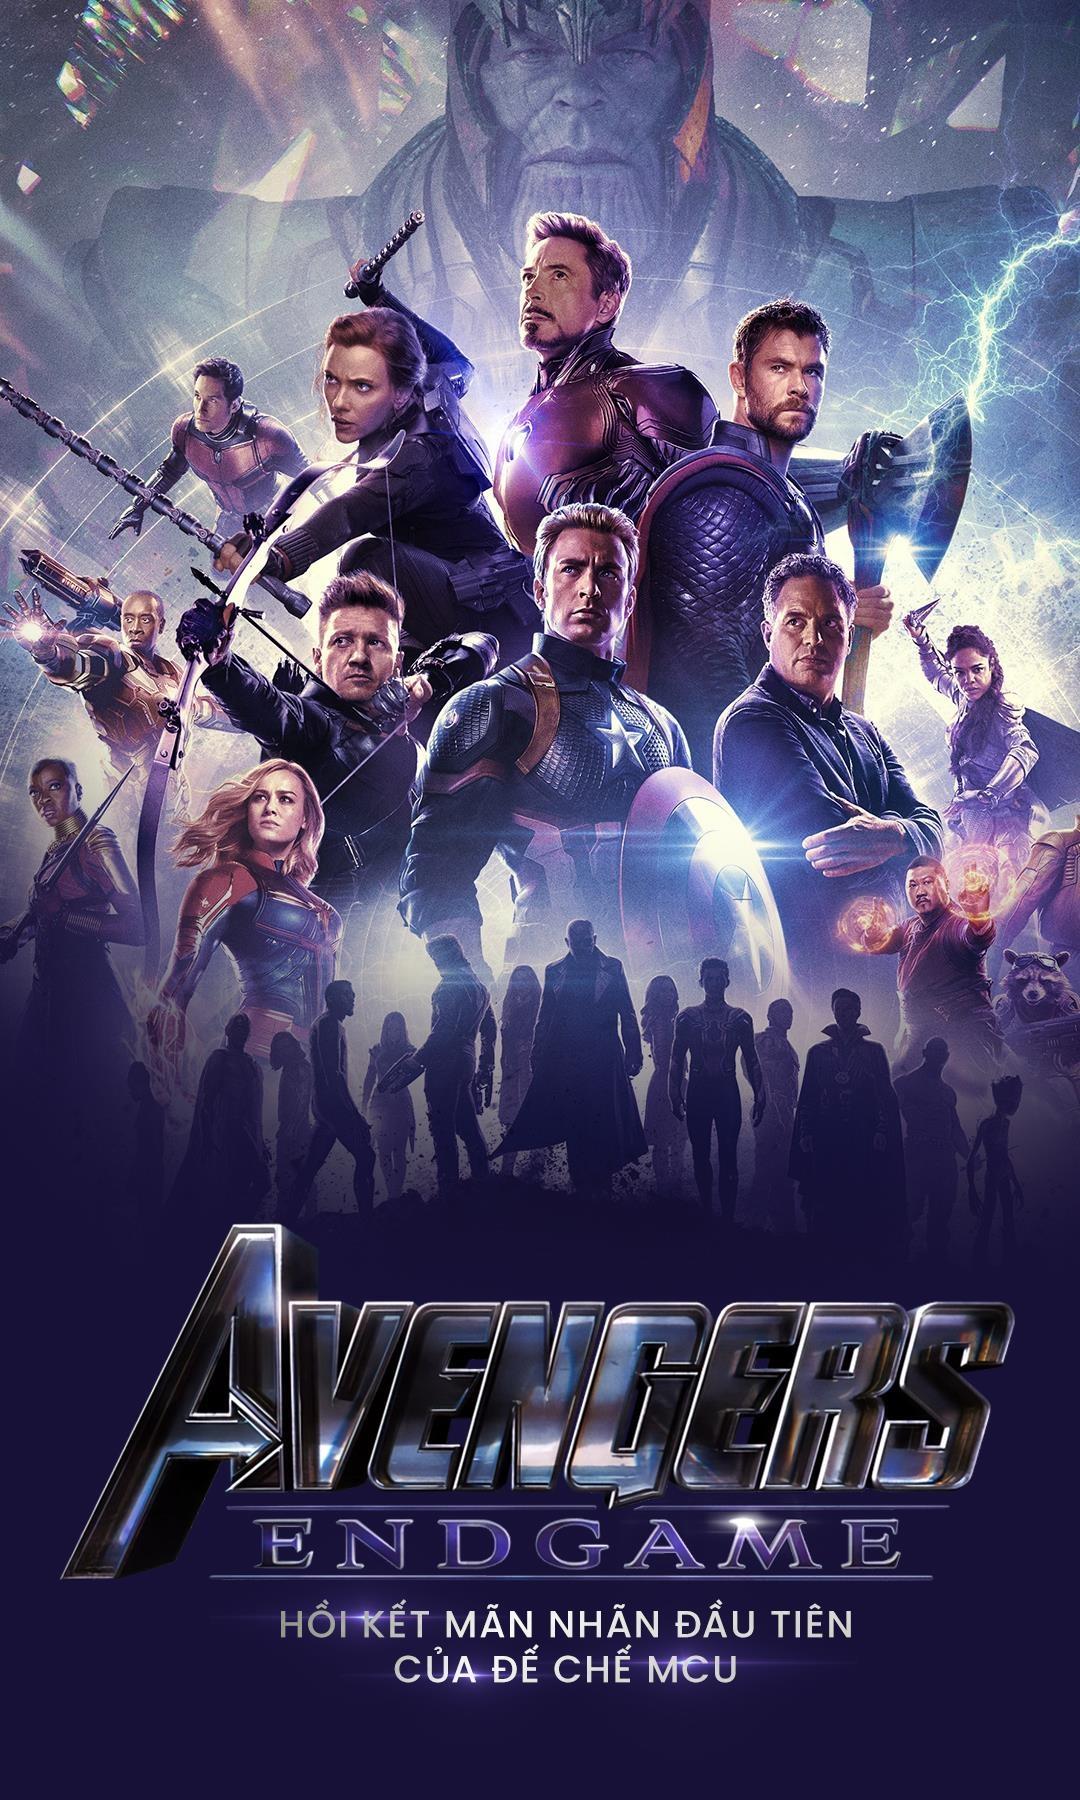 'Avengers: Endgame' - loi tam biet bi trang cua mot ky nguyen anh hung hinh anh 1